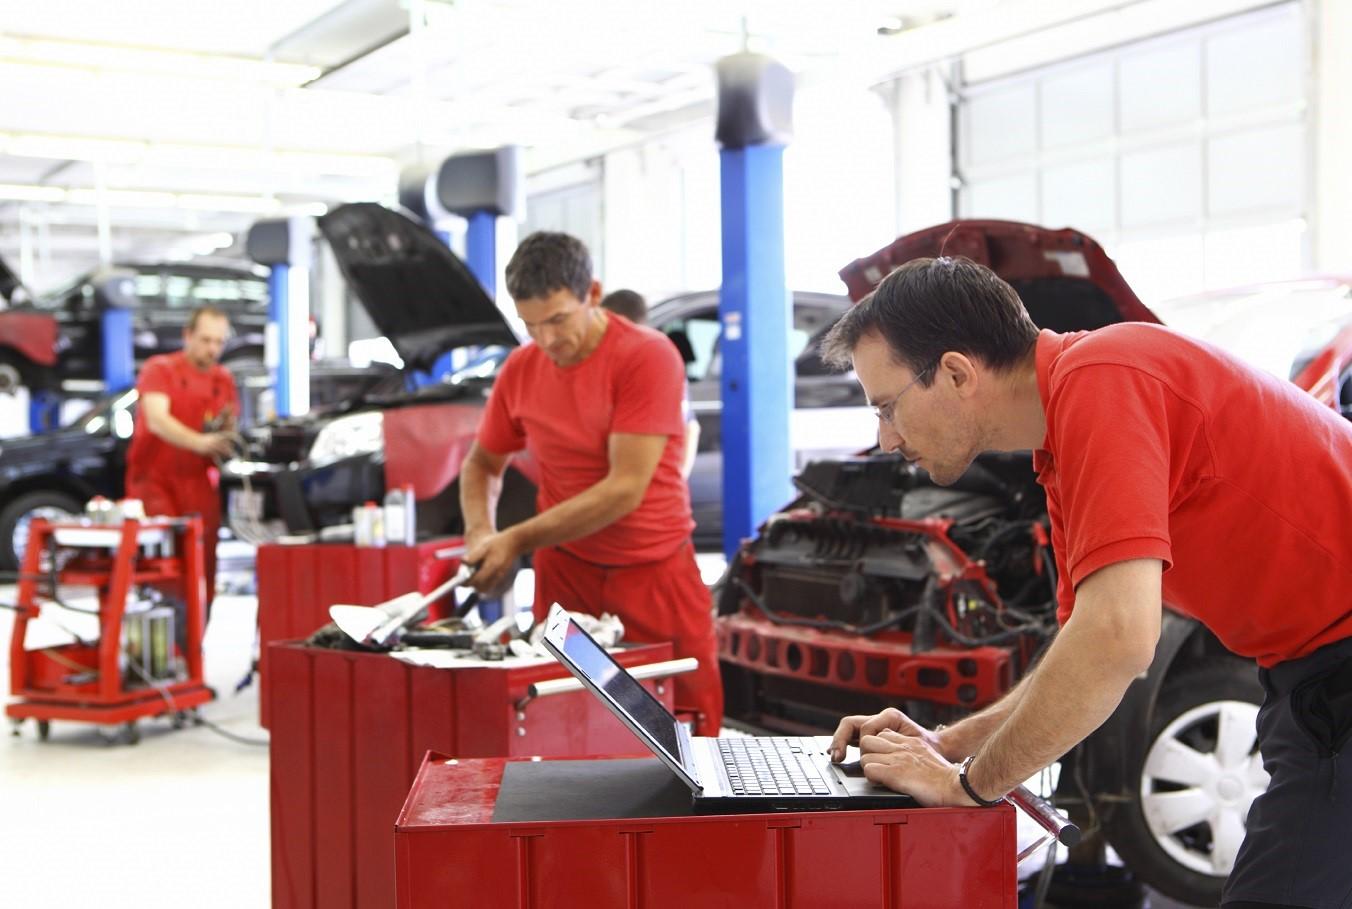 Our mechanics work hard to serve you!